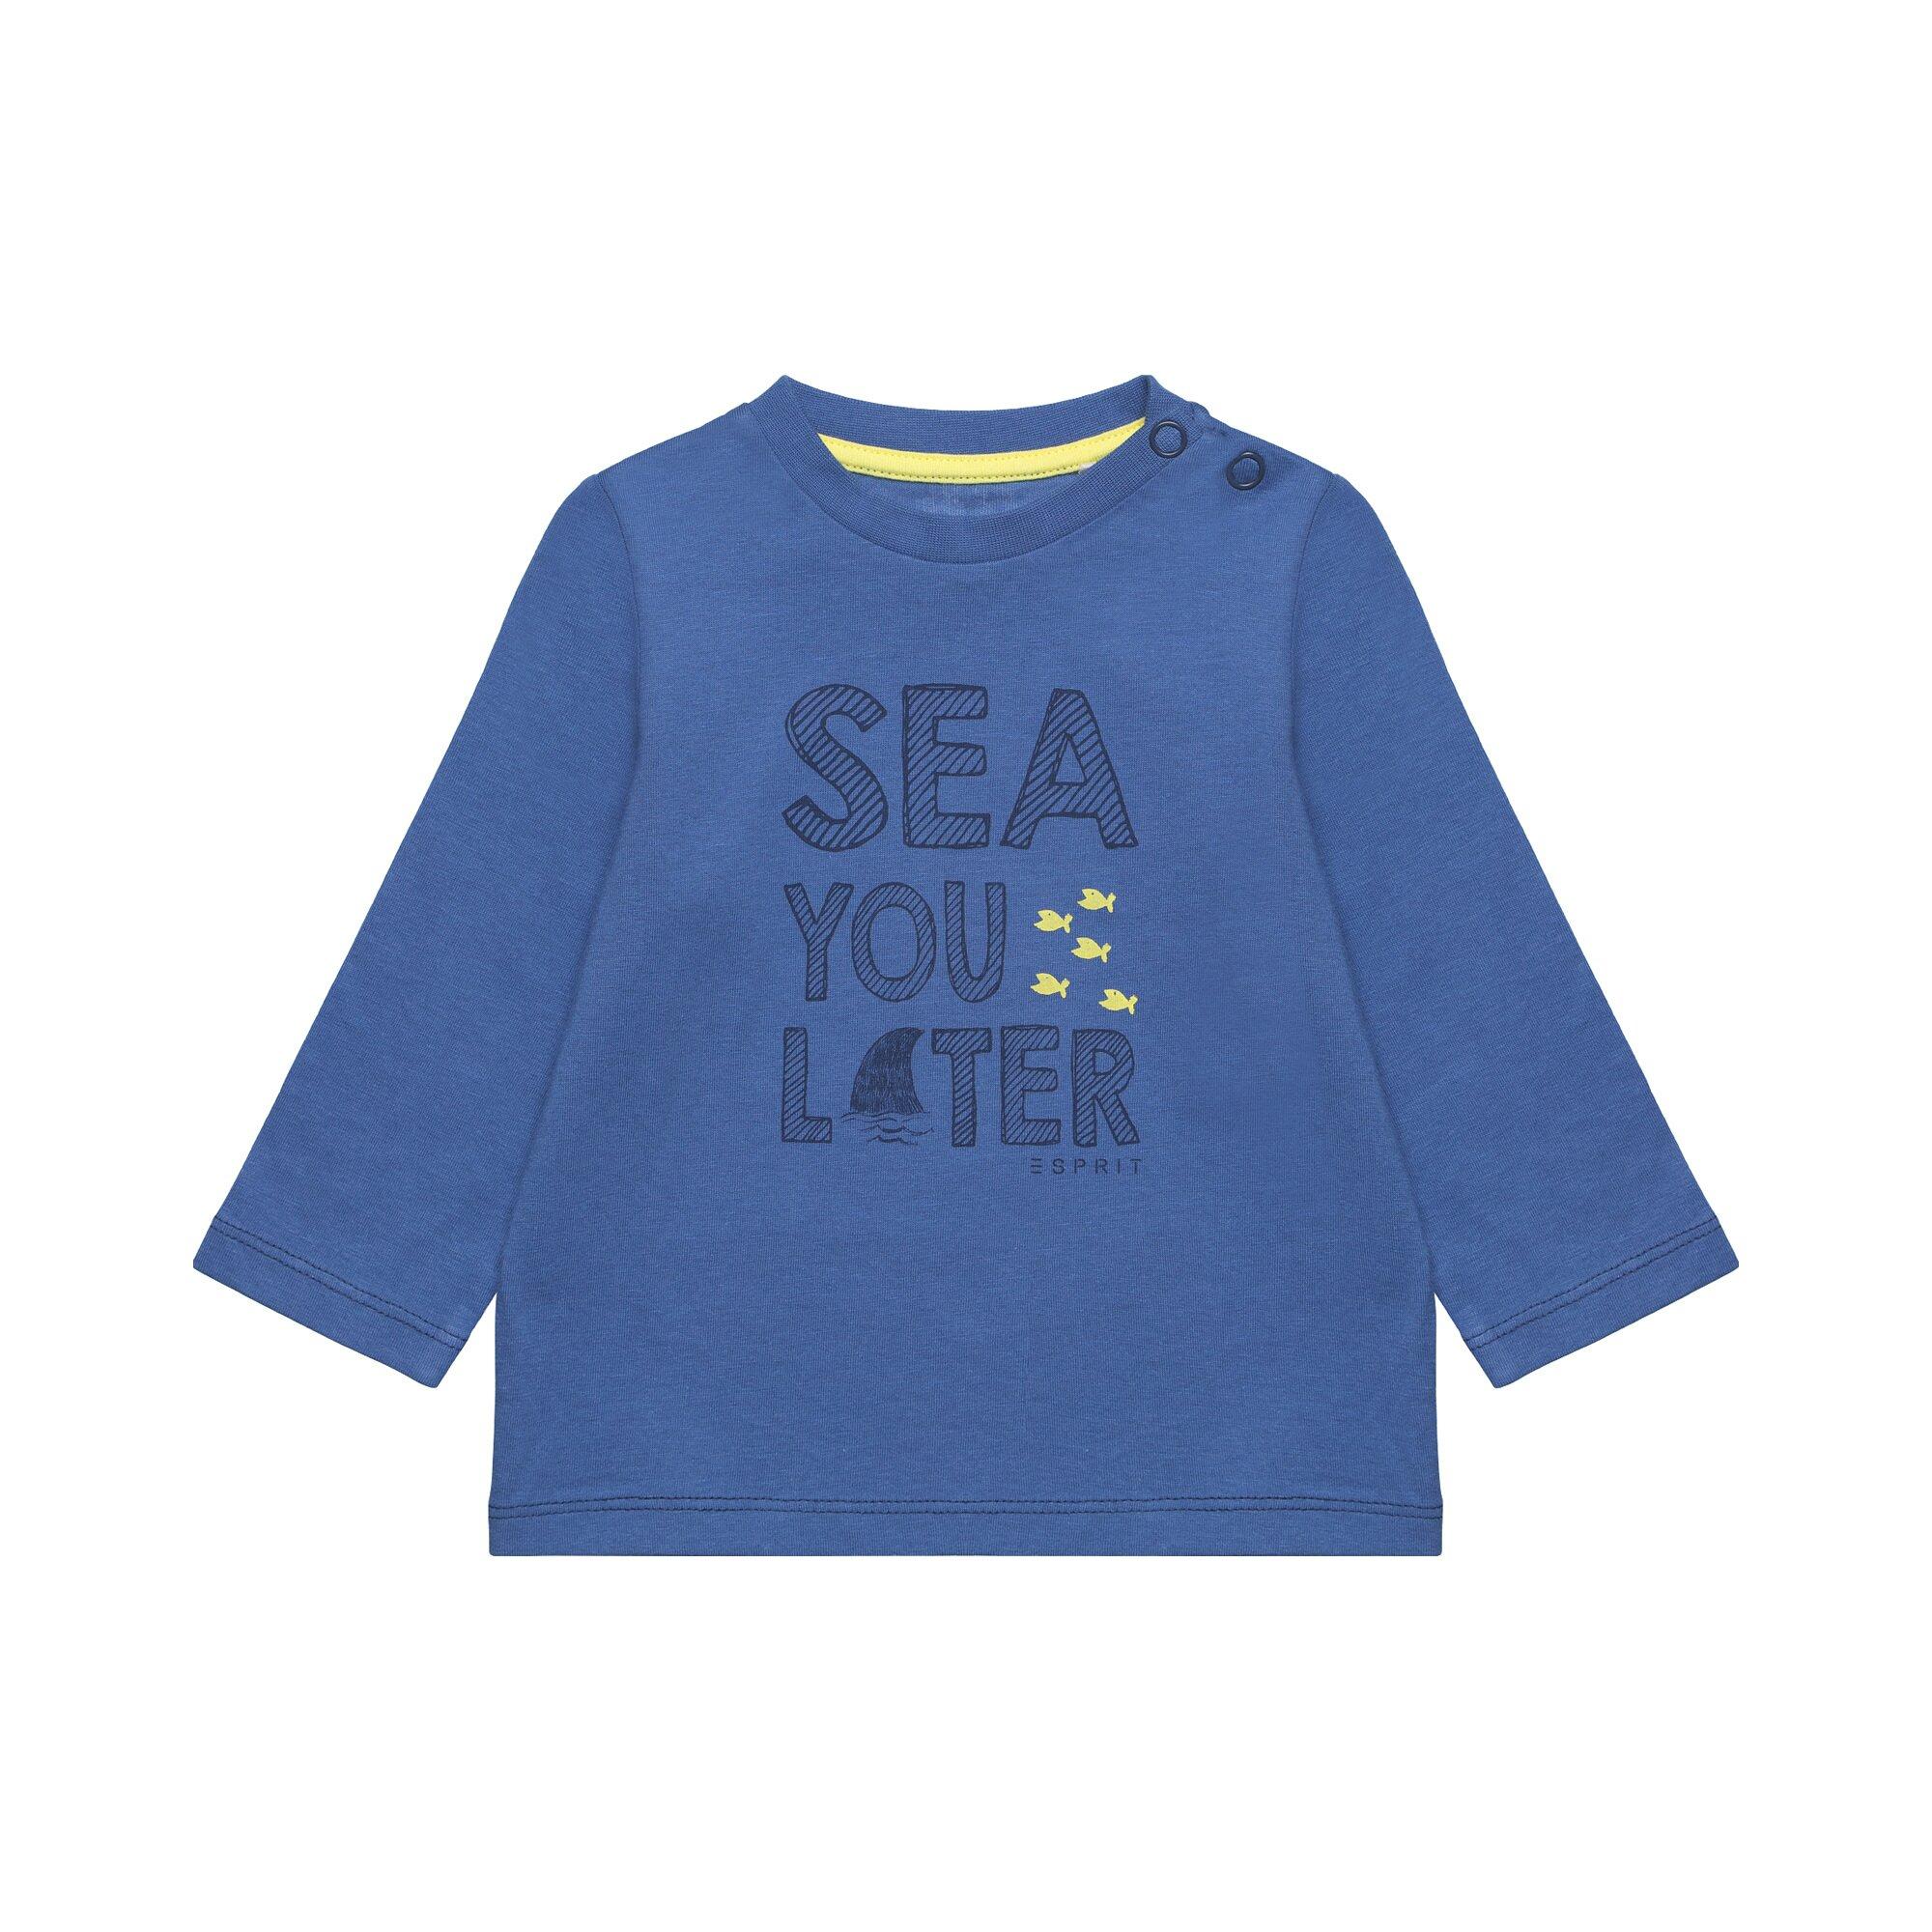 Esprit Shirt langarm See you later